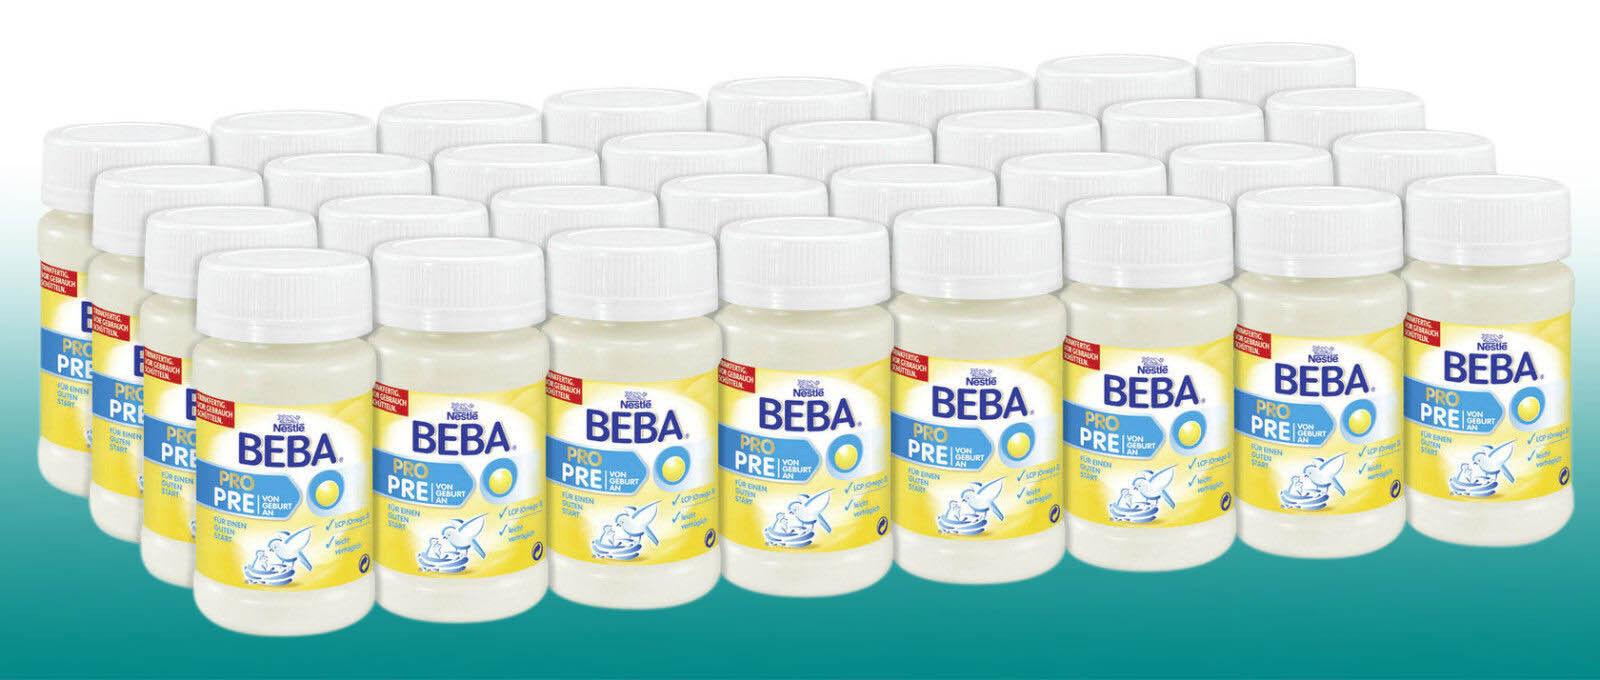 (11,45 €/Liter) Nestlé Beba PRO PRE TRINKFERTIG Babynahrung 32x90ml  Baby